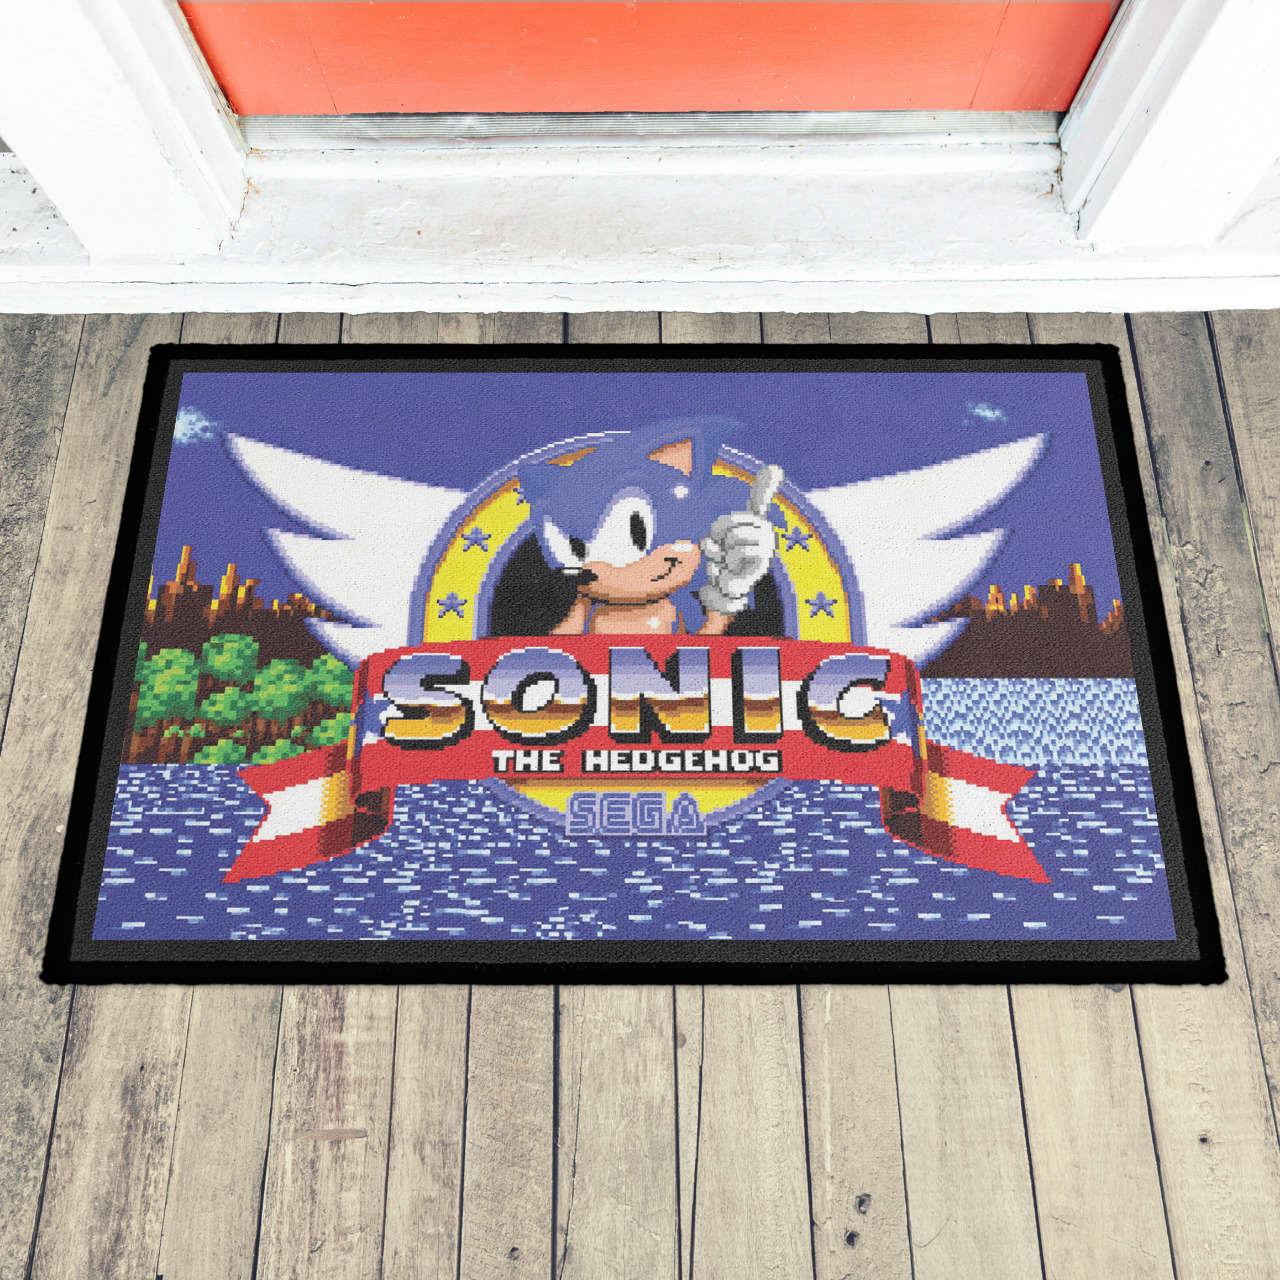 Capacho (Tapete) Sonic the Hedgehog